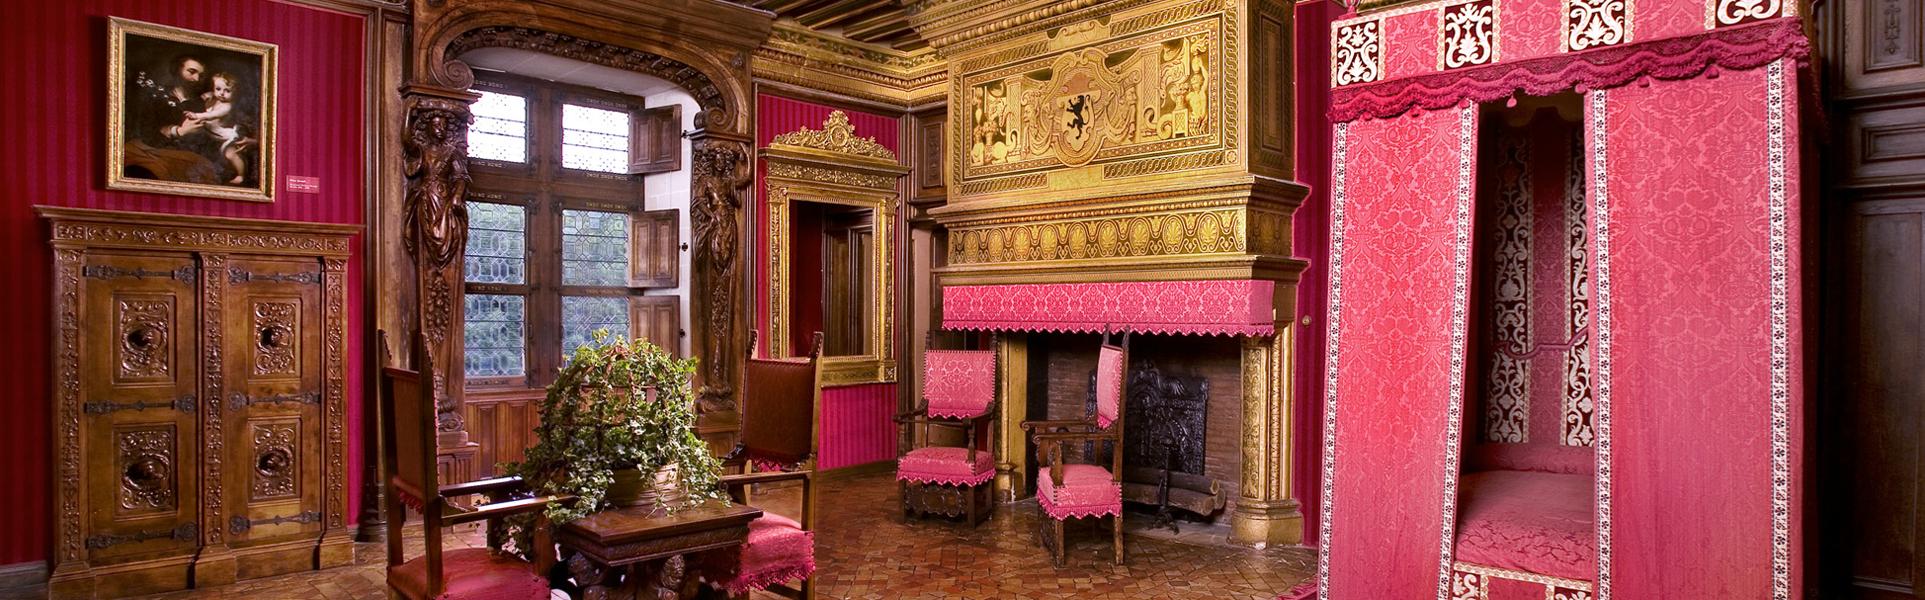 loara castle cover